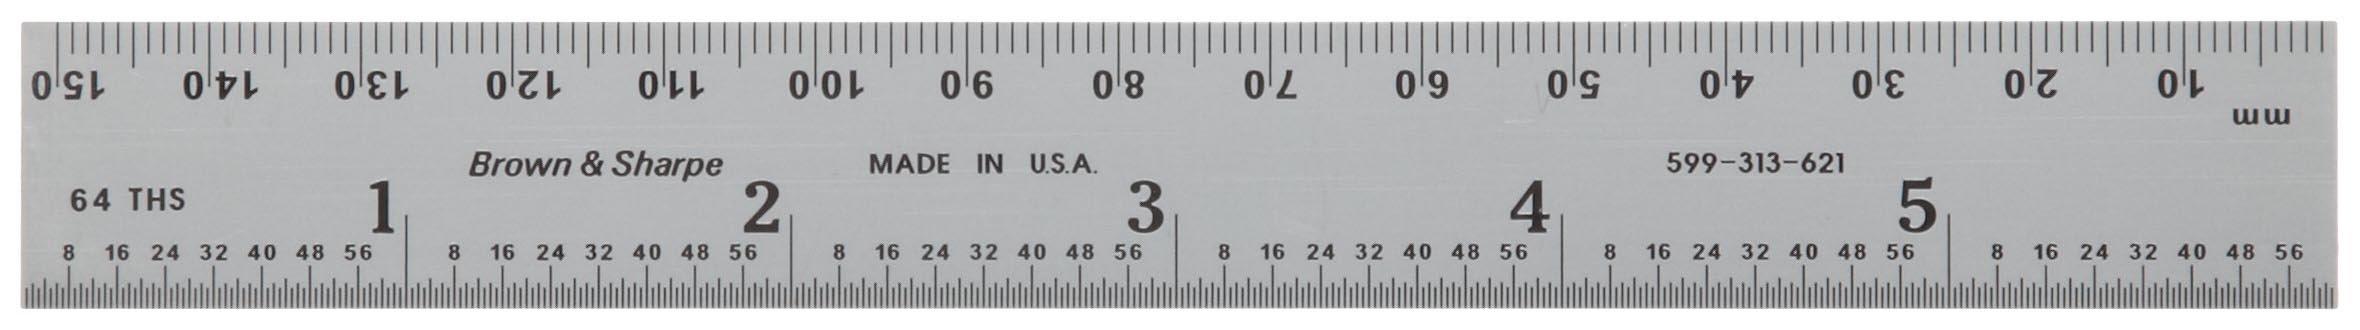 Brown & Sharpe 599-313-621 Chrome Finish Tempered Steel Rule, 6'' Length